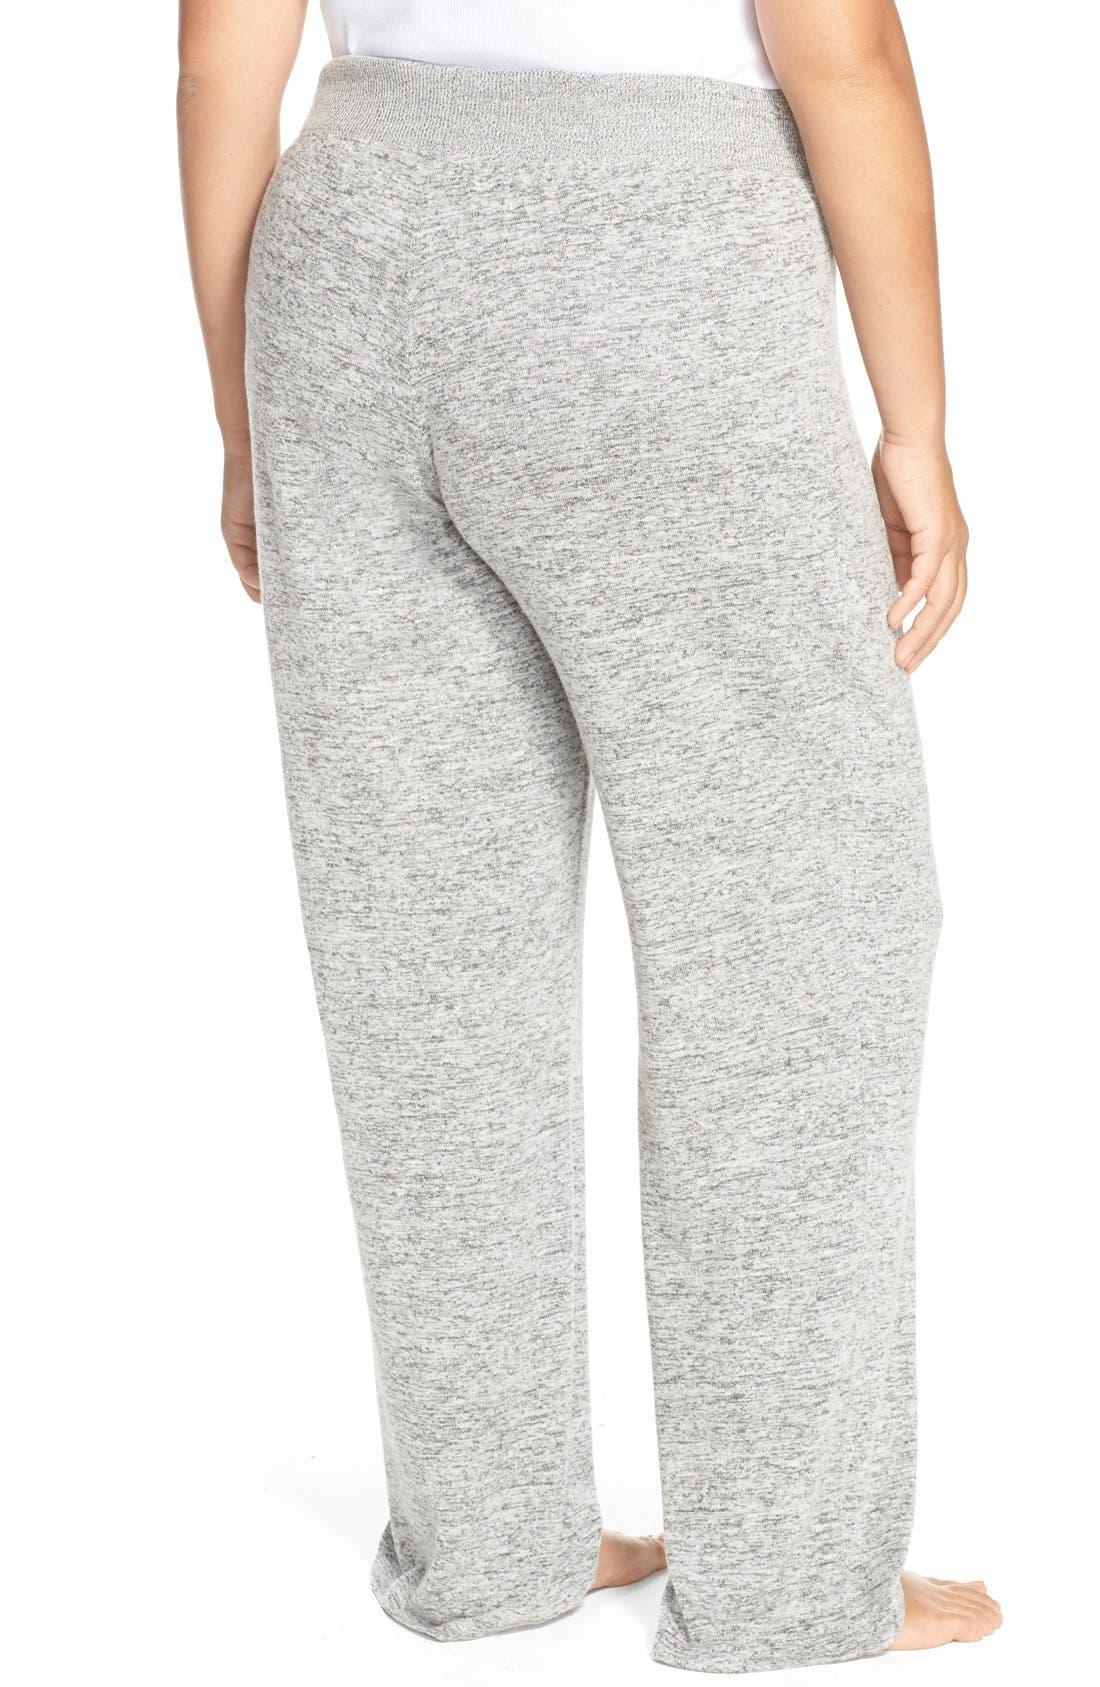 Alternate Image 2  - Make + Model 'Best Boyfriend' Brushed Hacci Lounge Pants (Plus Size)